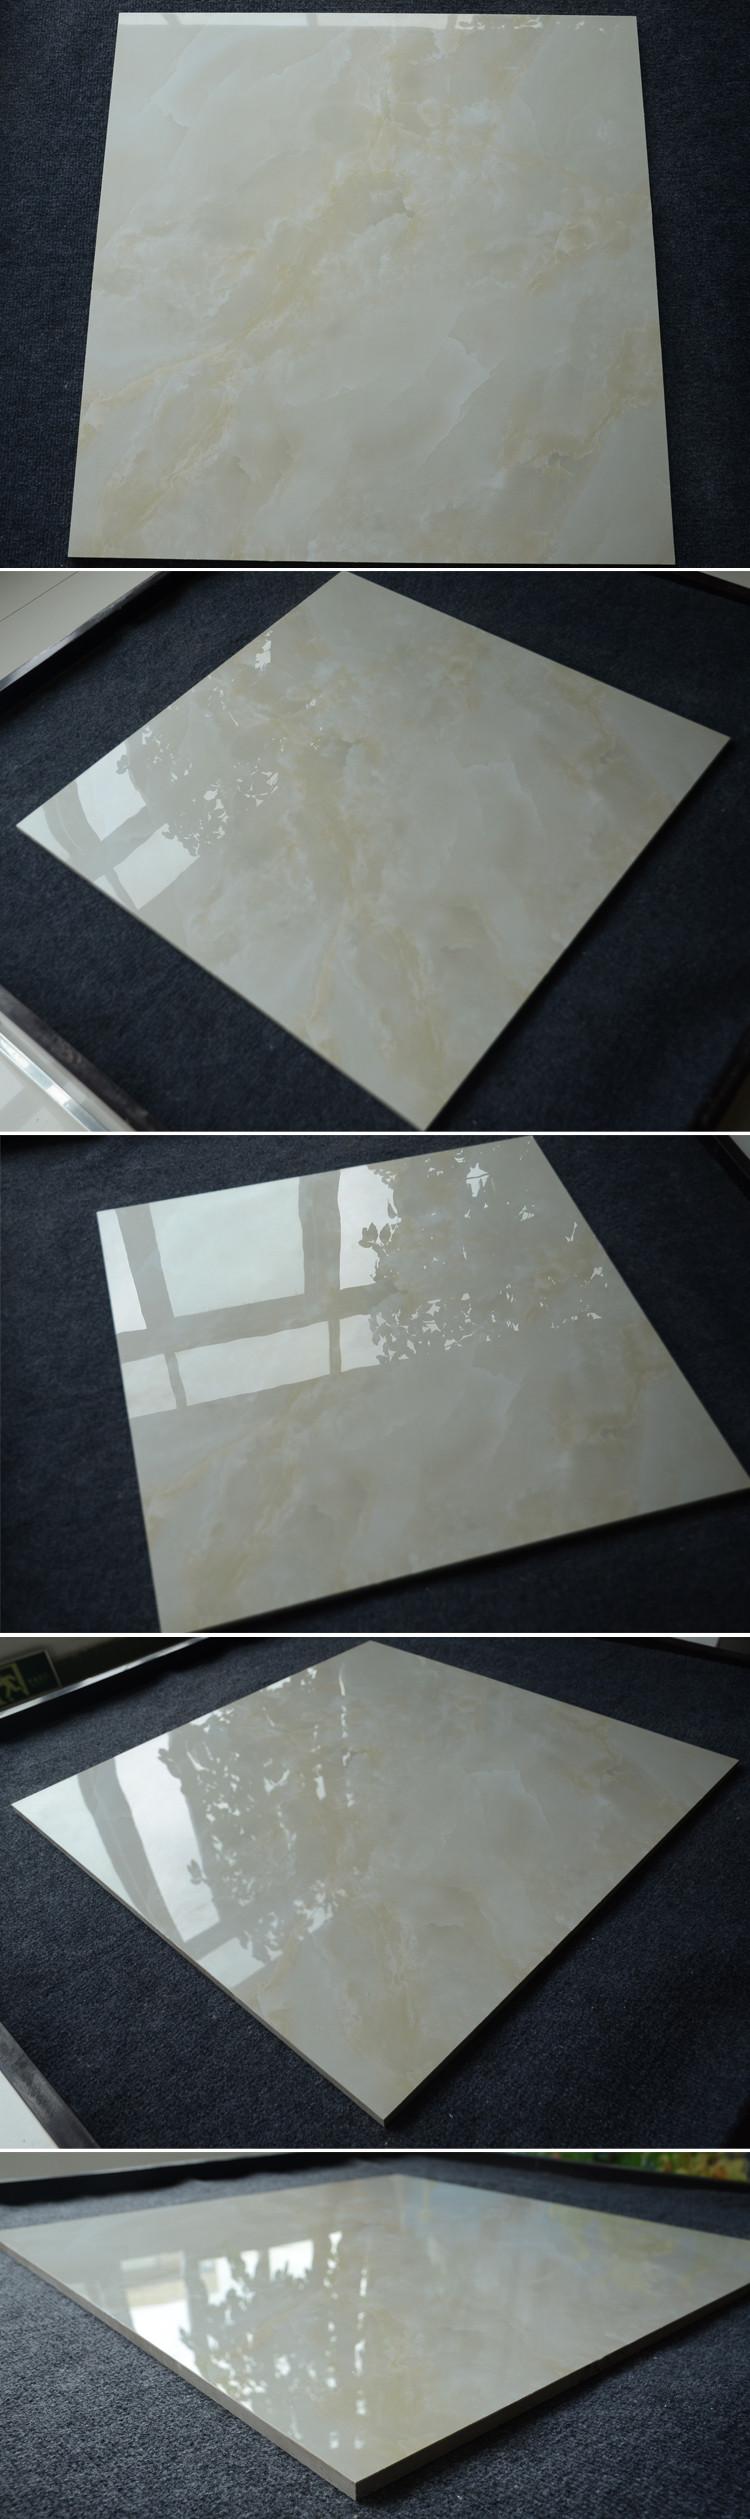 Hs625gn Crema Marfil Marble Tile / Calacatta White Ceramic Tile ...